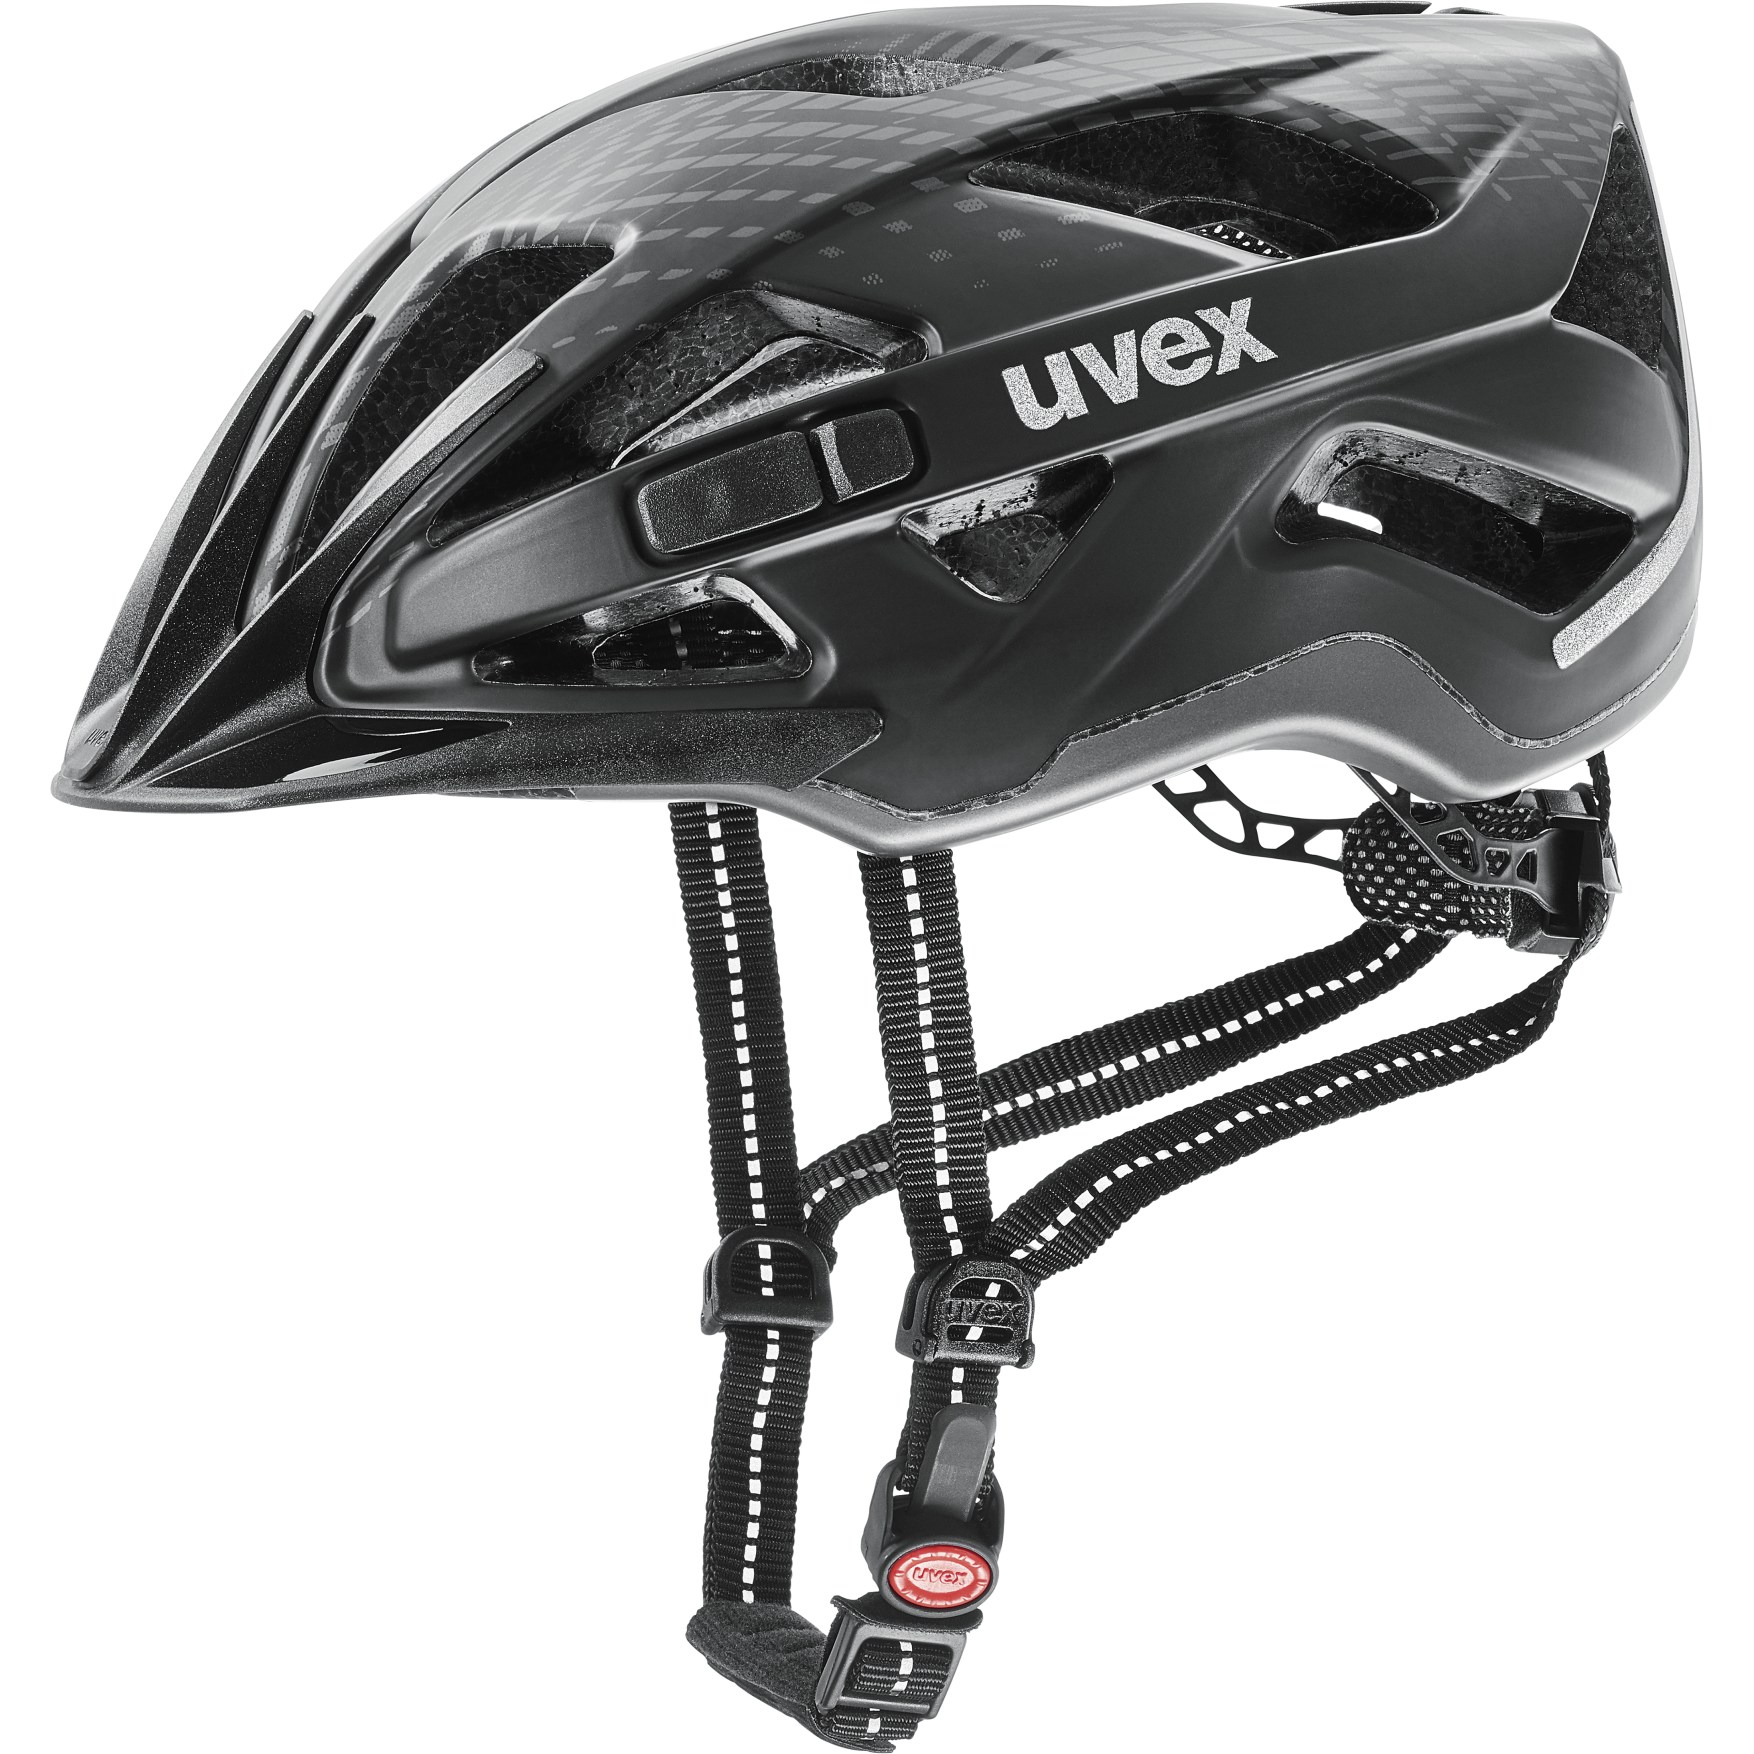 Uvex city active Helmet - black mat